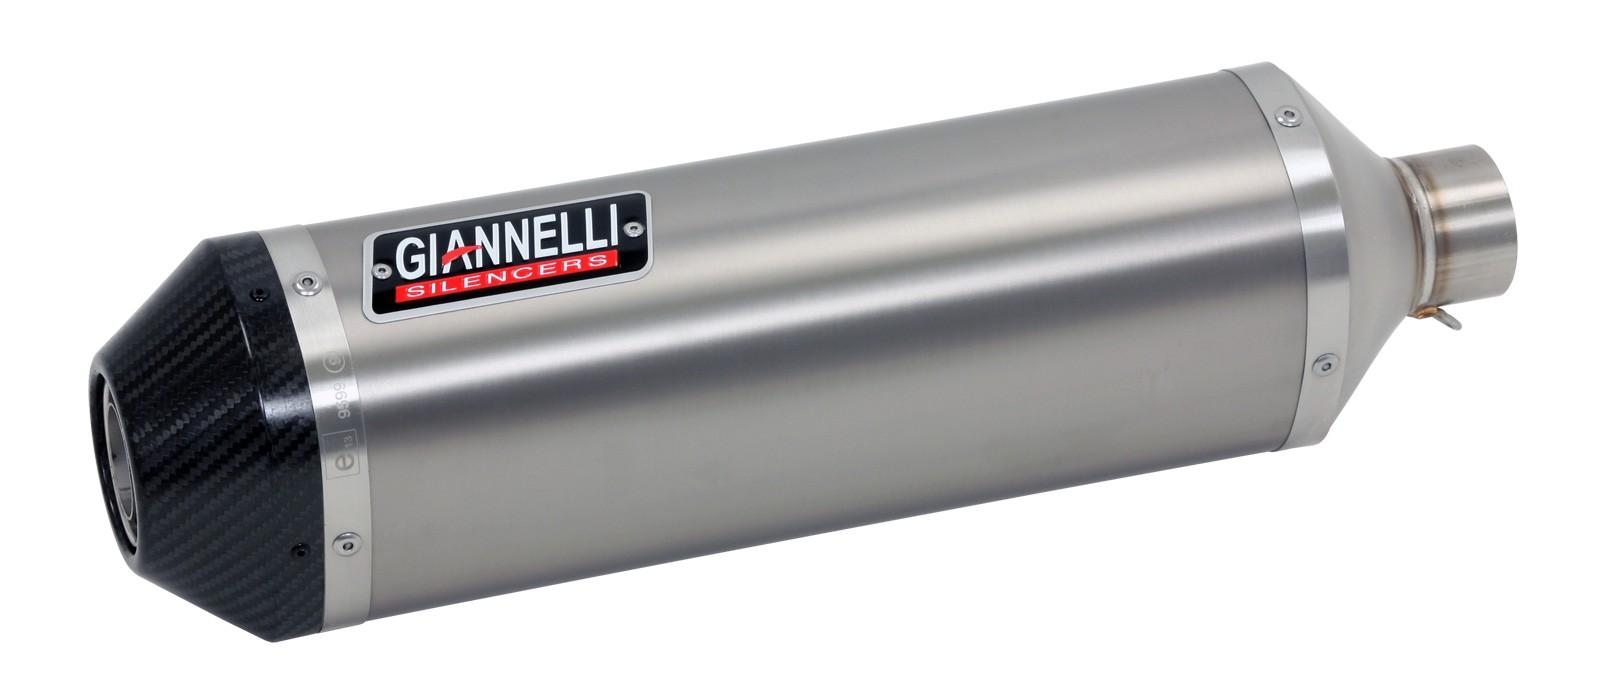 ESCAPES GIANNELLI YAMAHA - Sistema completo IPERSPORT Silenciador carbono con terminación carbono Yamaha MT-125 Giannell